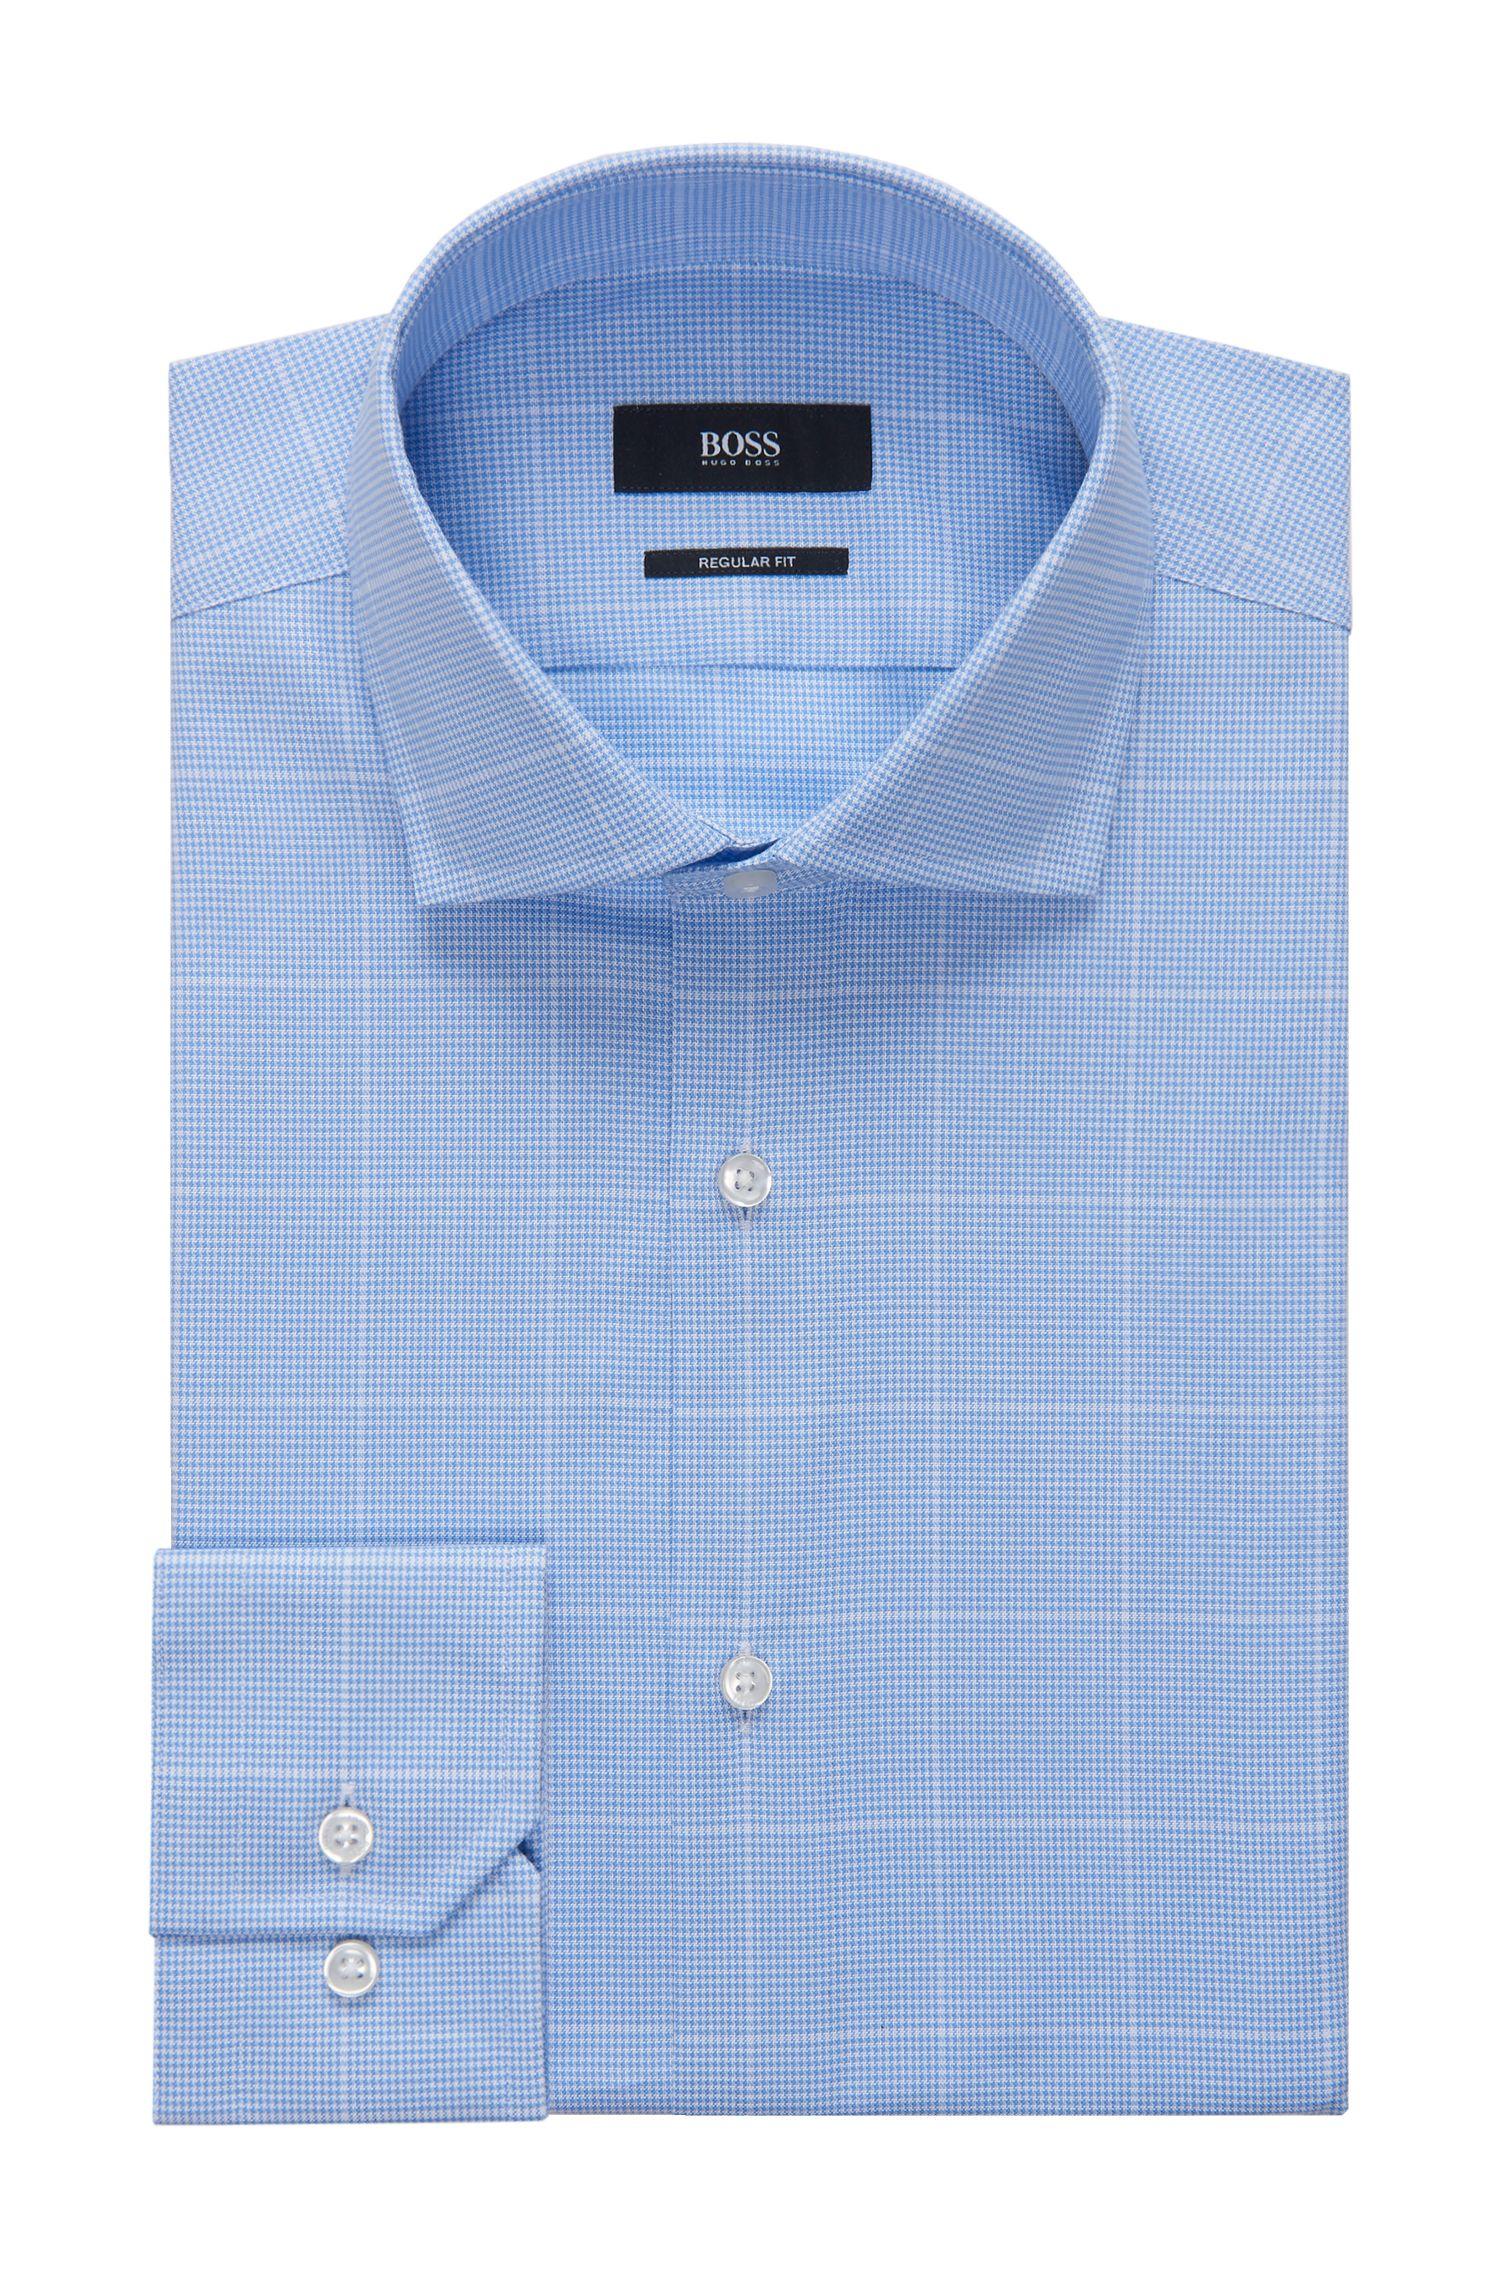 Windowpane Cotton Dress Shirt, Regular Fit   Gordon